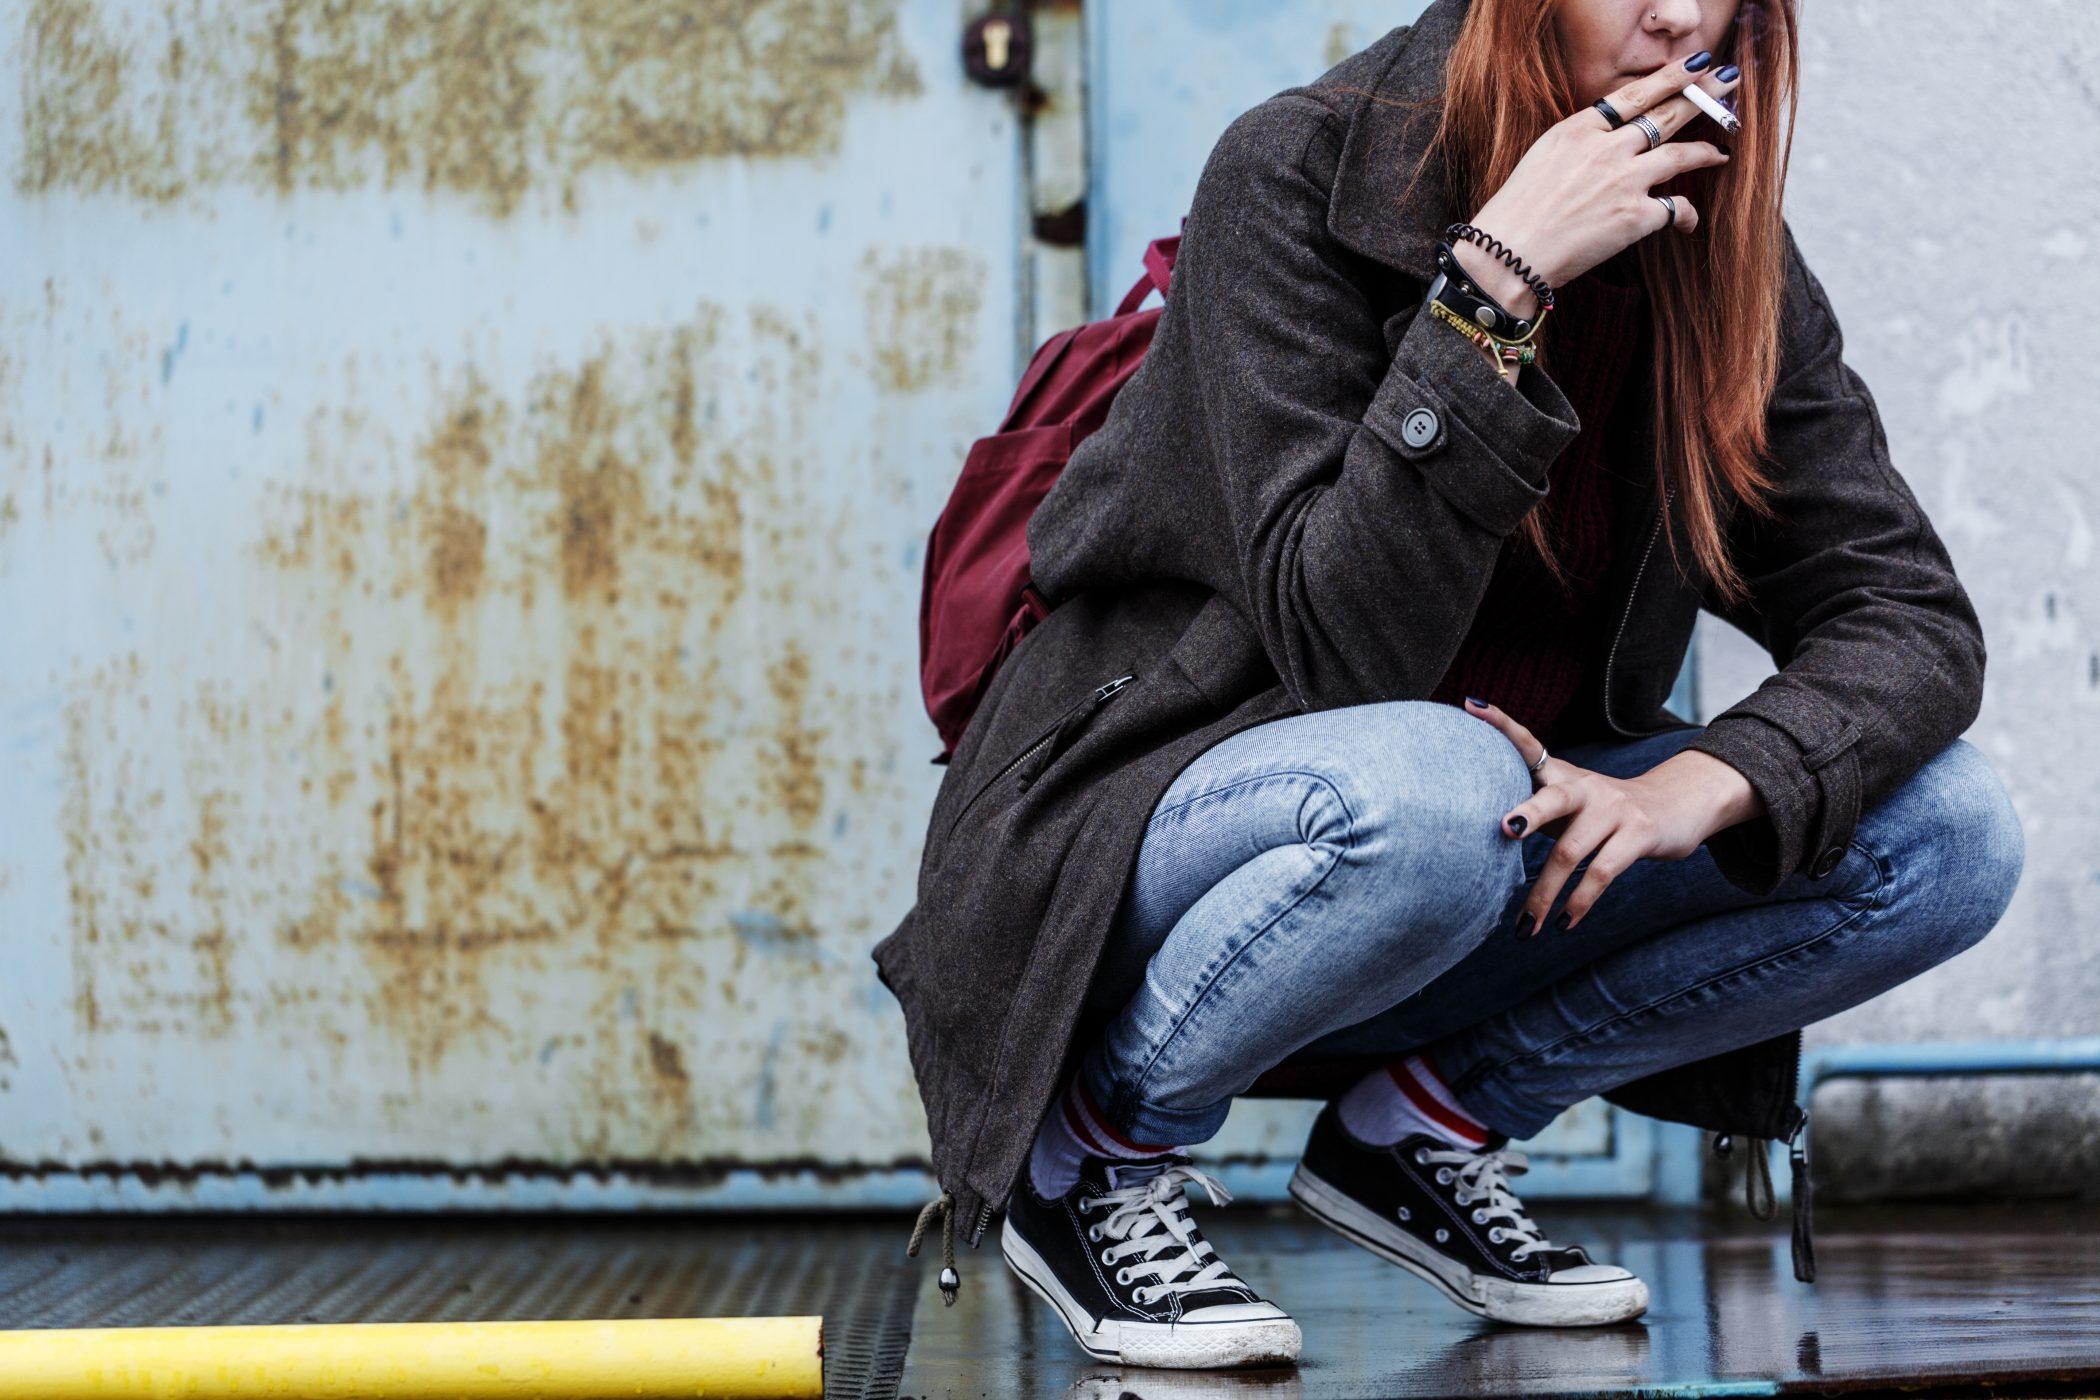 Riotous teenager smoking cigarette